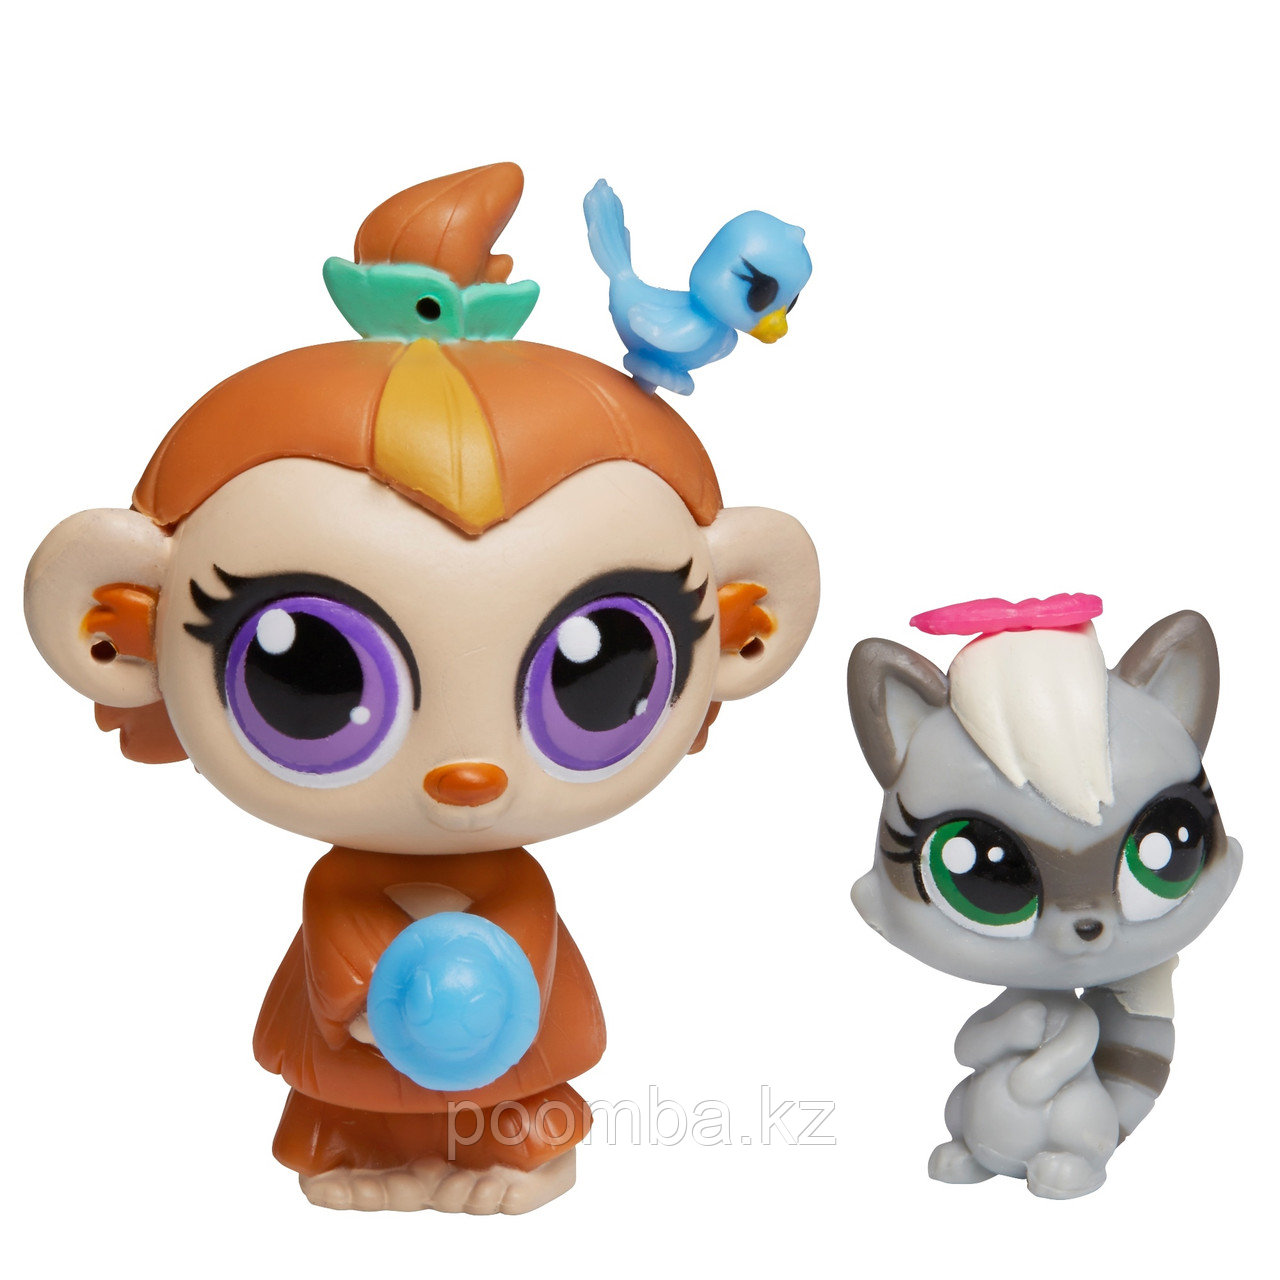 Littlest Pet Shop и ее малыш - Mushroom Lee